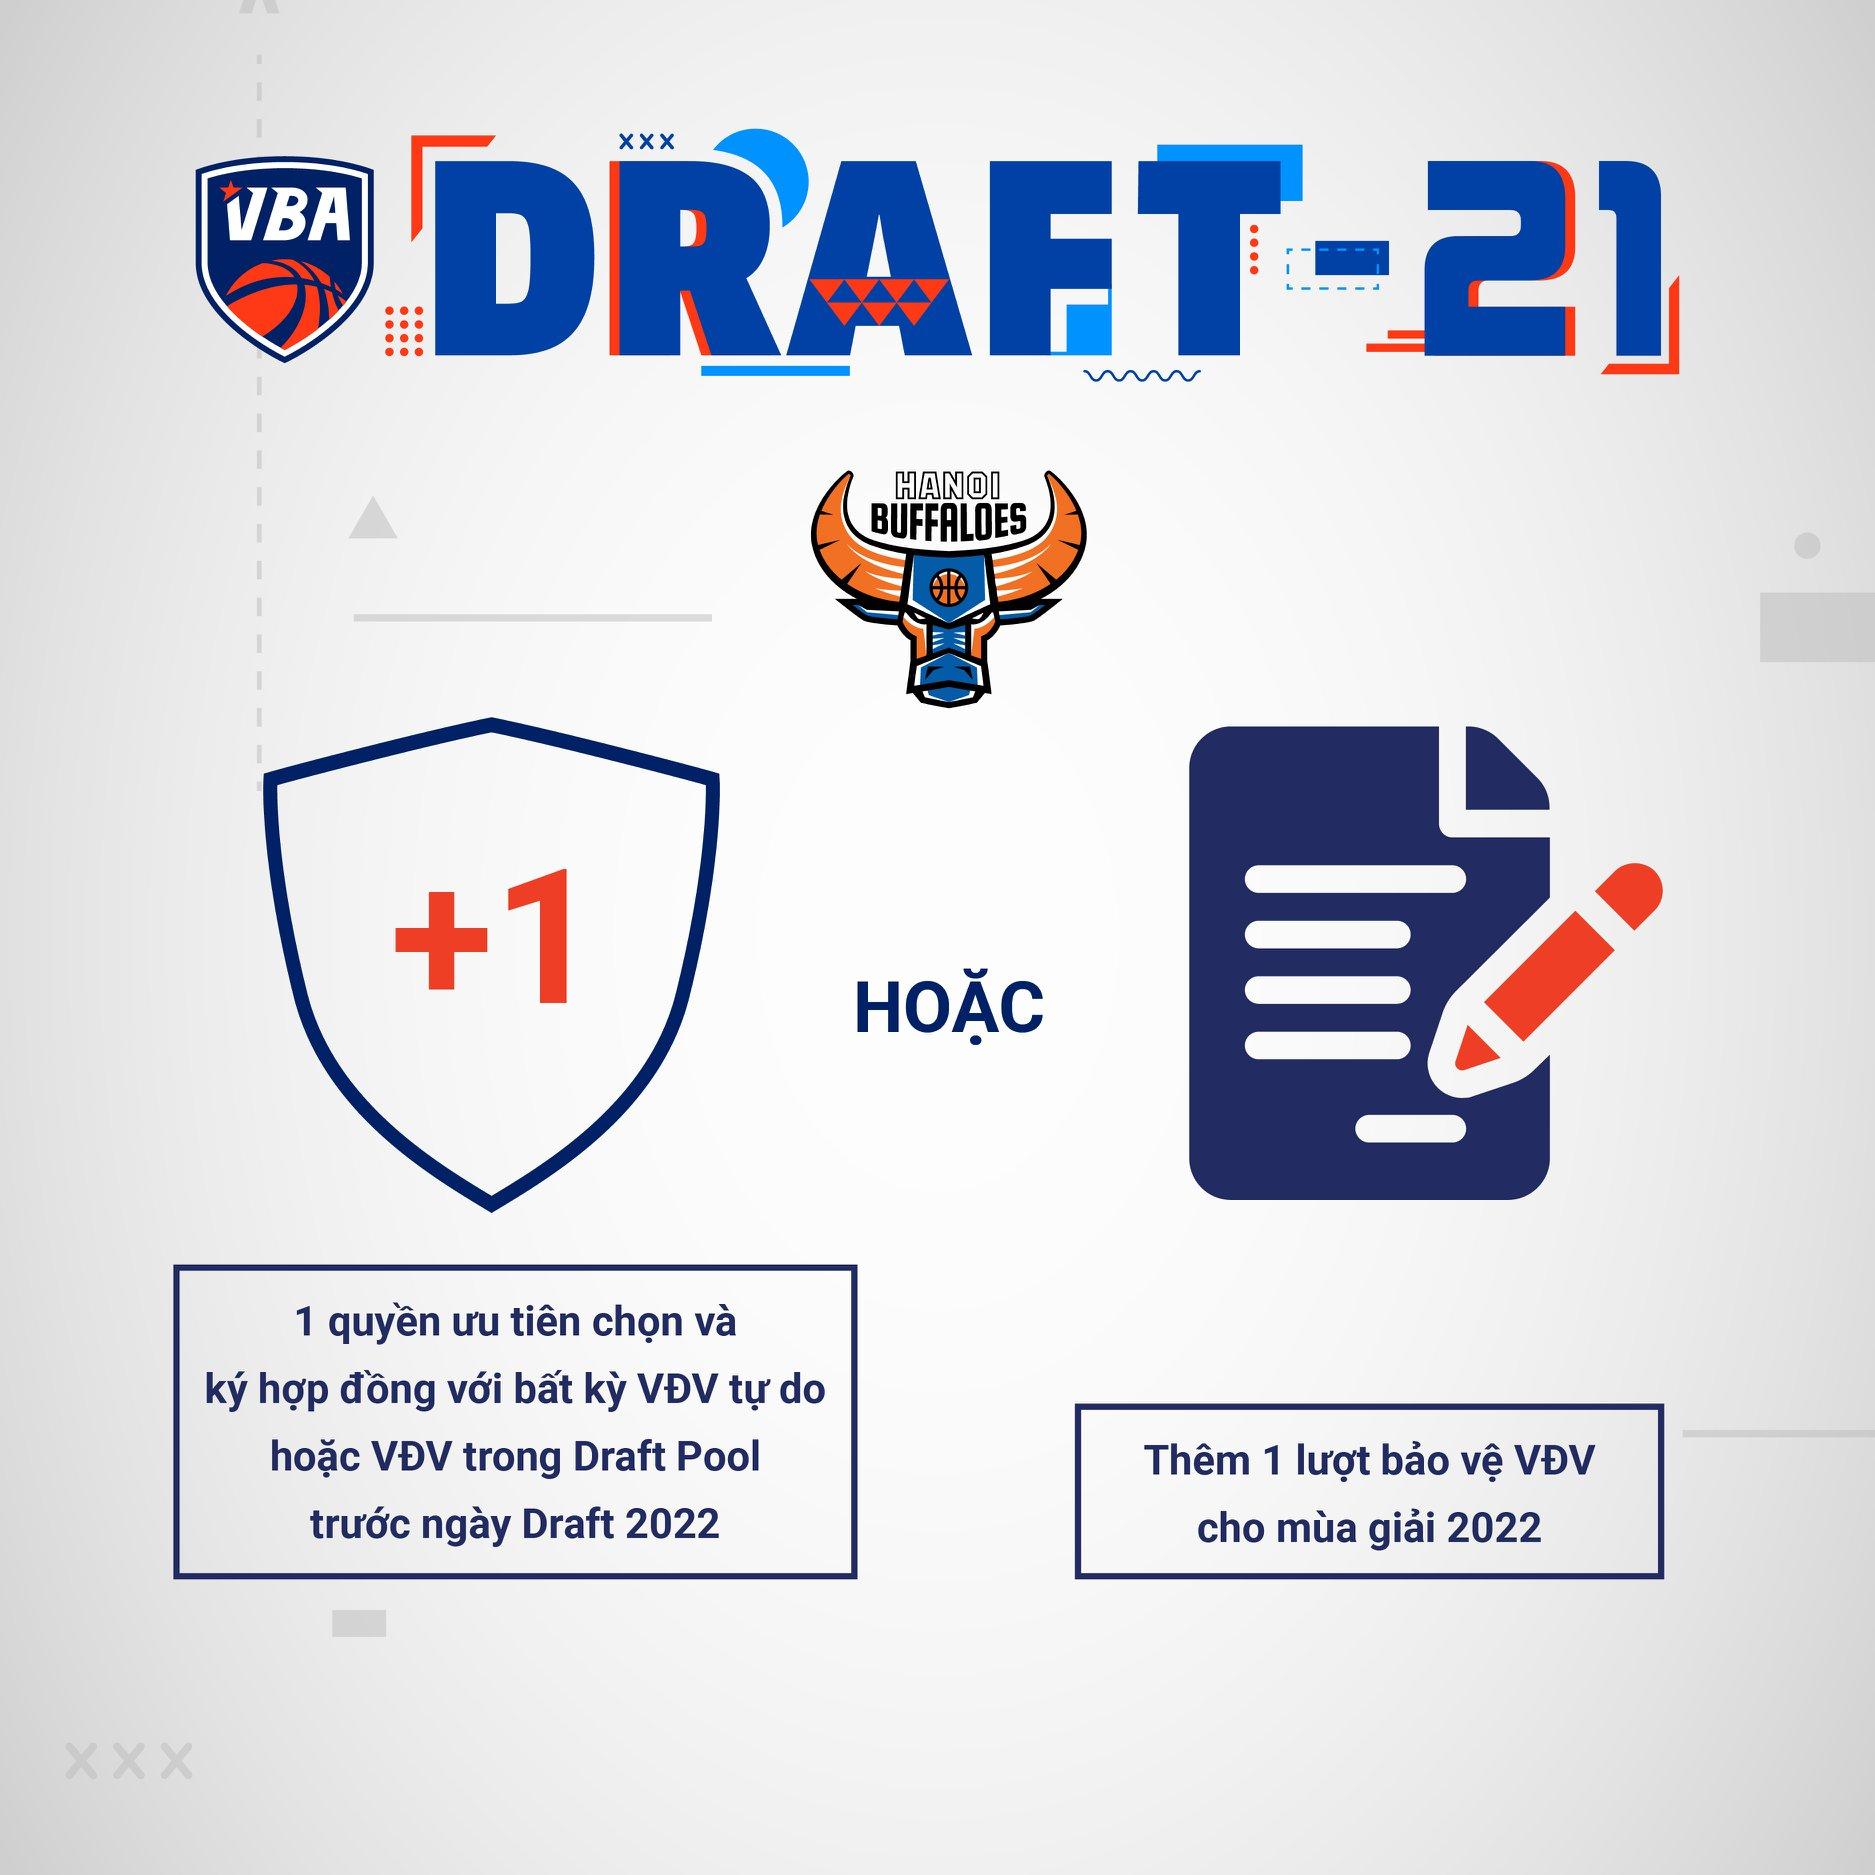 hnb-draft-21